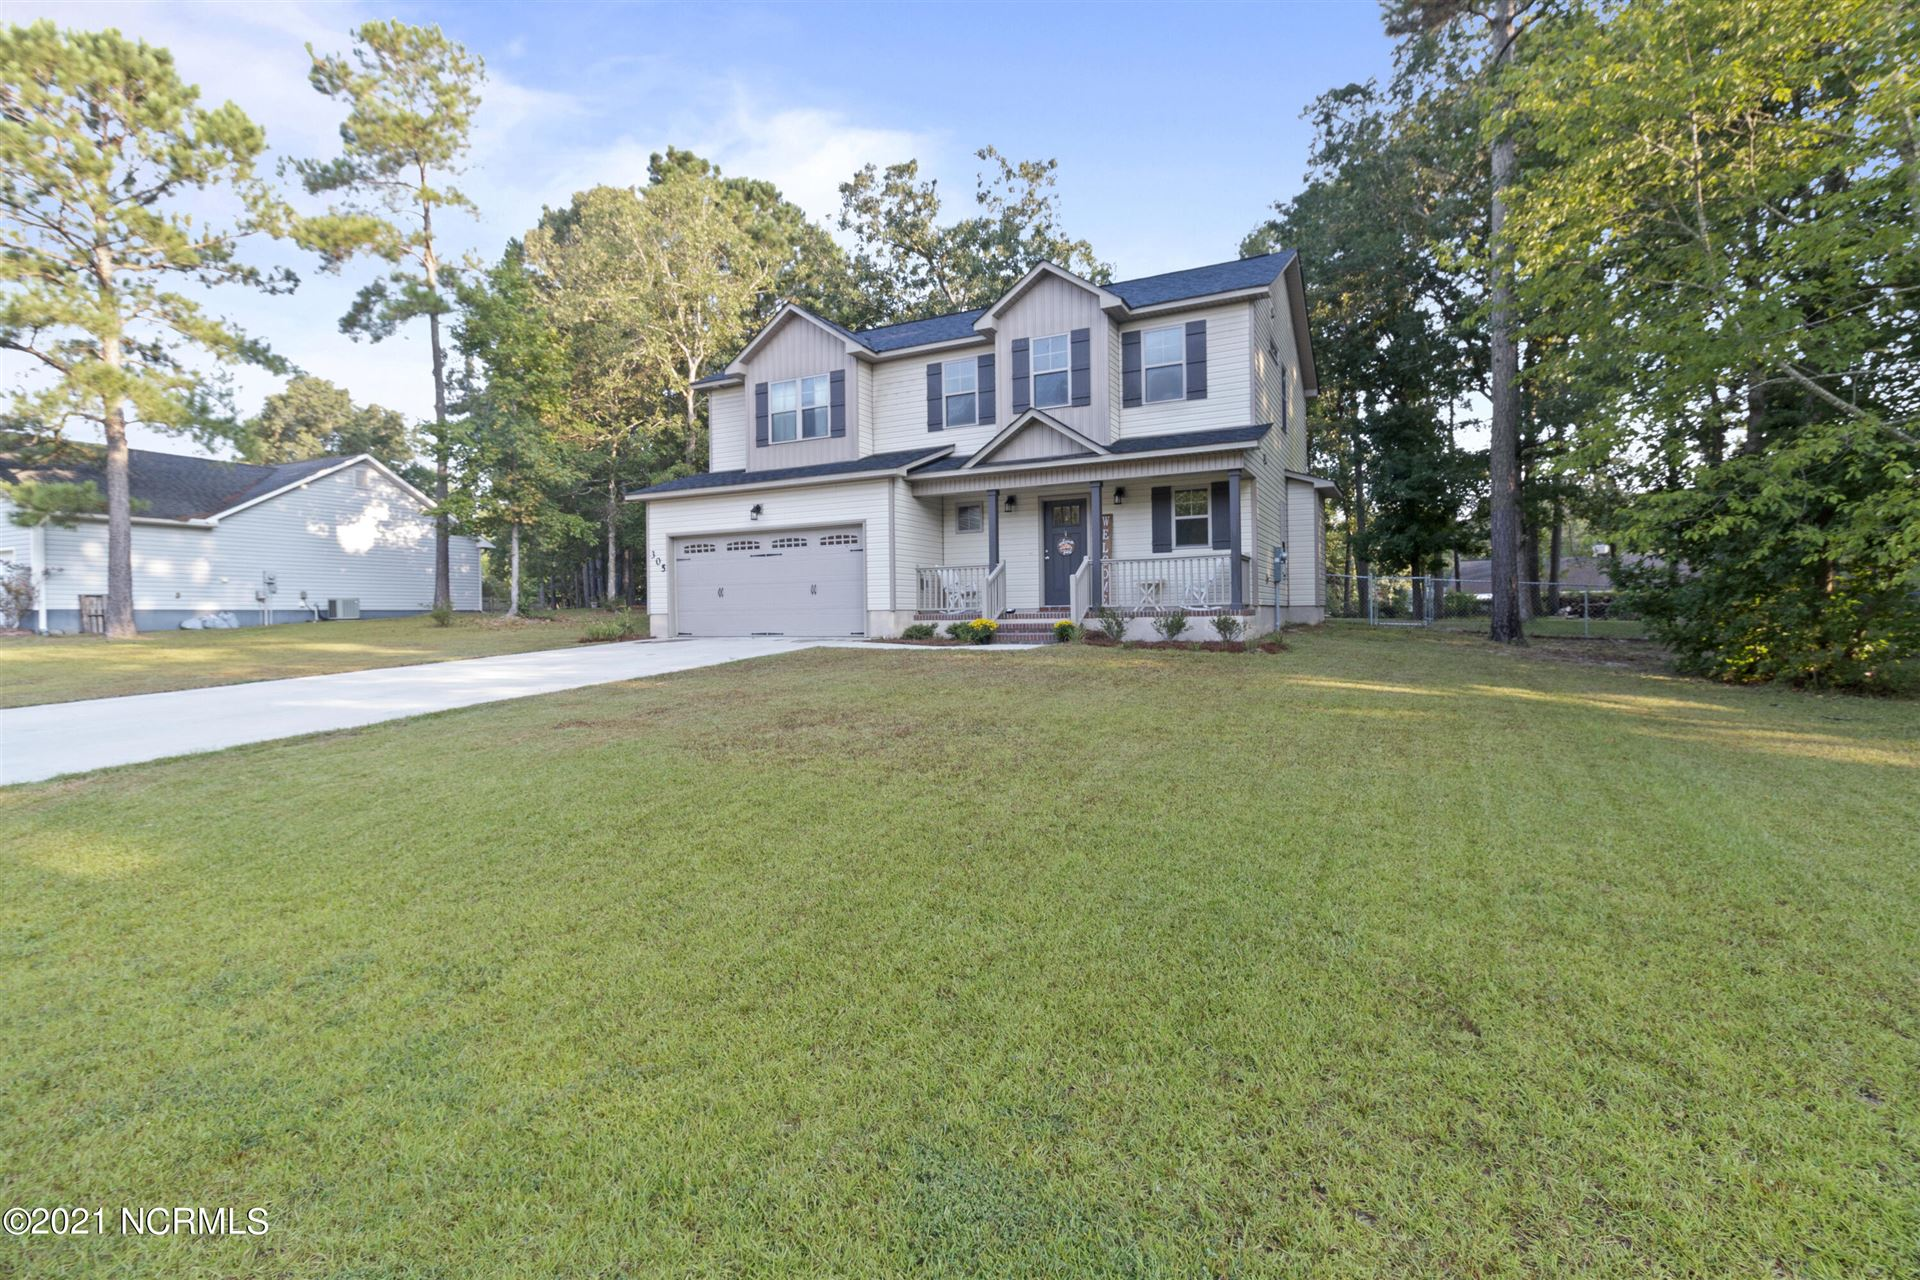 Photo of 305 Foliage Court, Jacksonville, NC 28540 (MLS # 100290815)